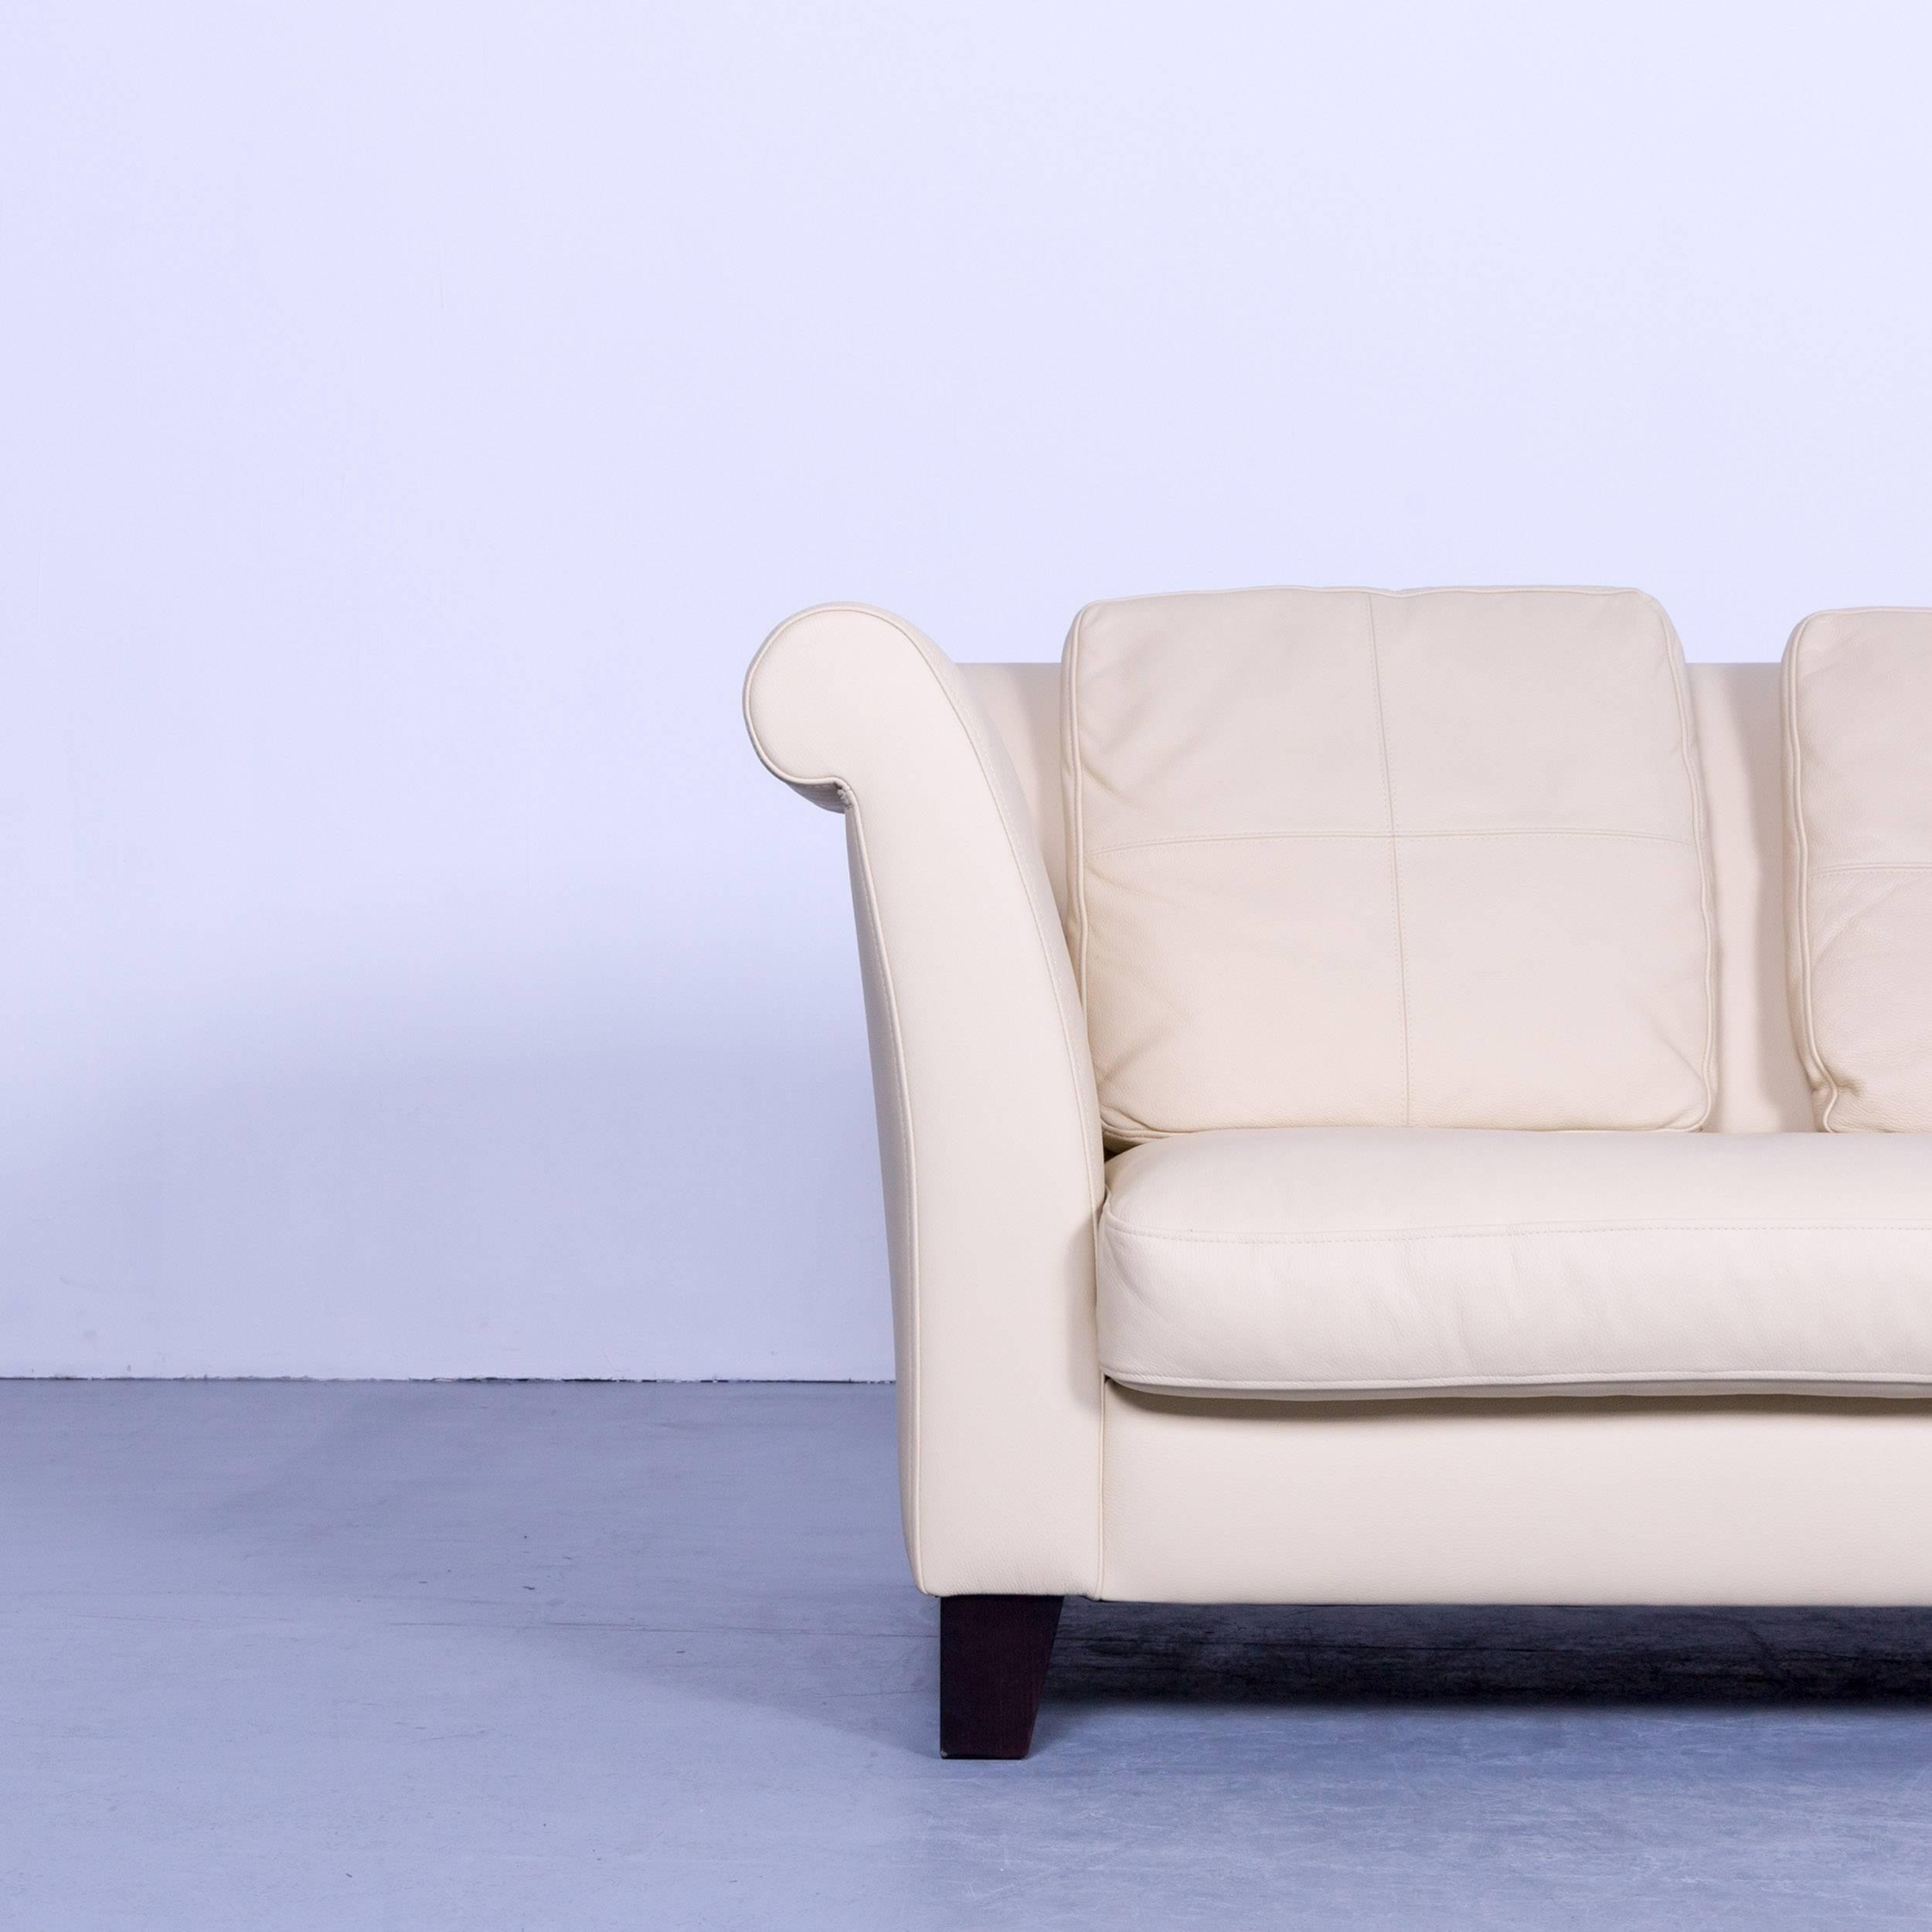 Amazing German Machalke Ritz Designer Sofa Leather Crme Beige Threeseat  Couch Modern For Sale With Sofa Beige Leder With Sofa Leder Creme